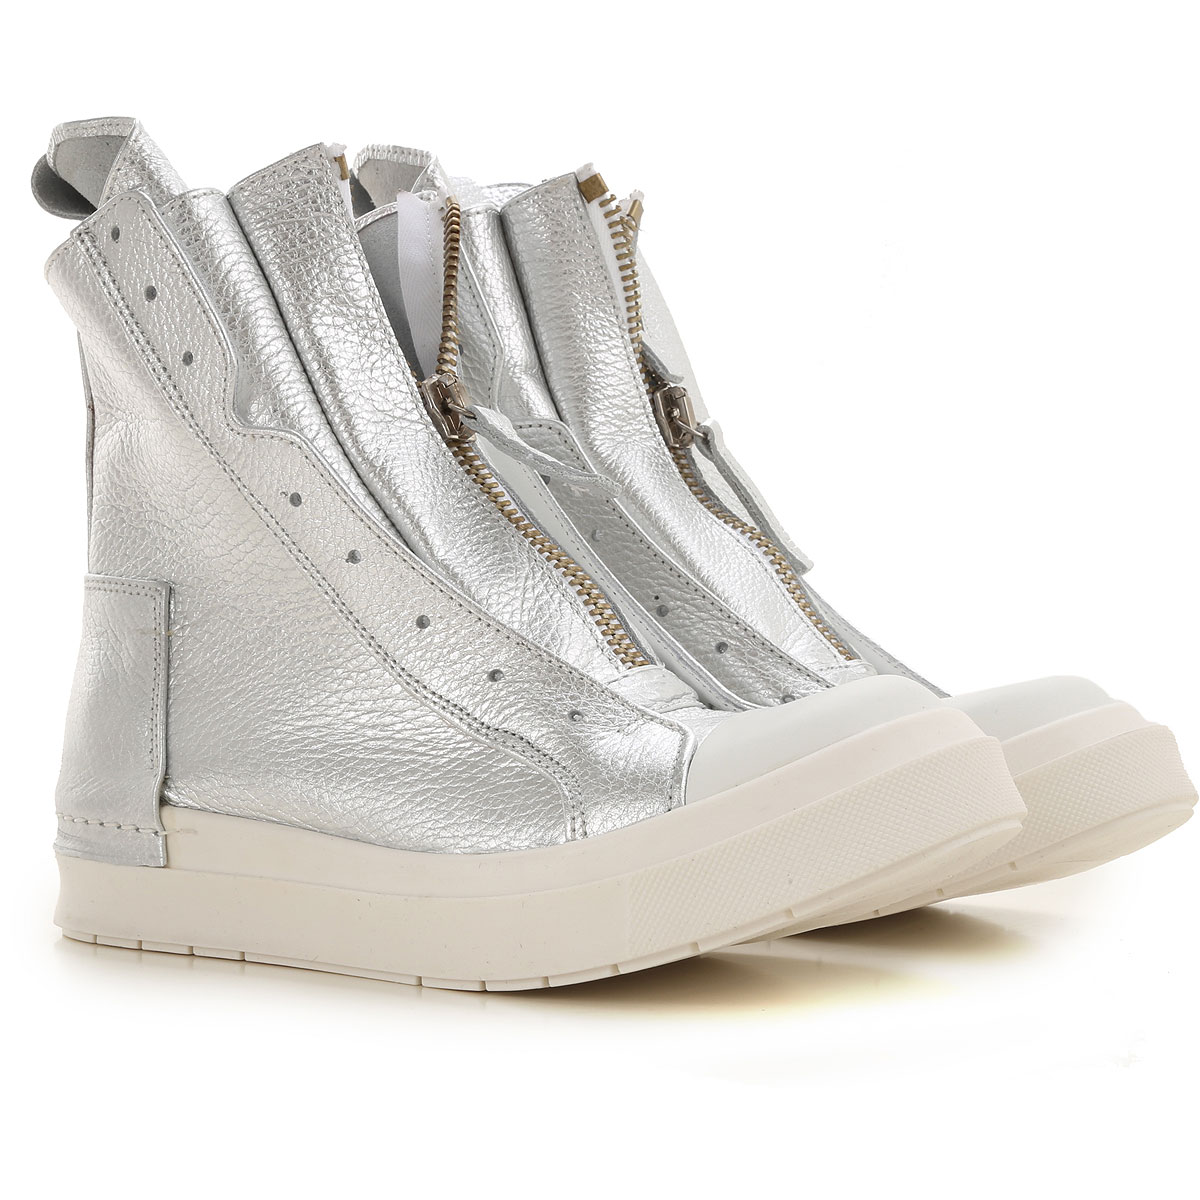 Cinzia Araia Sneaker Femme, Argent, Cuir, 2019, 35 36 37 38 39 40